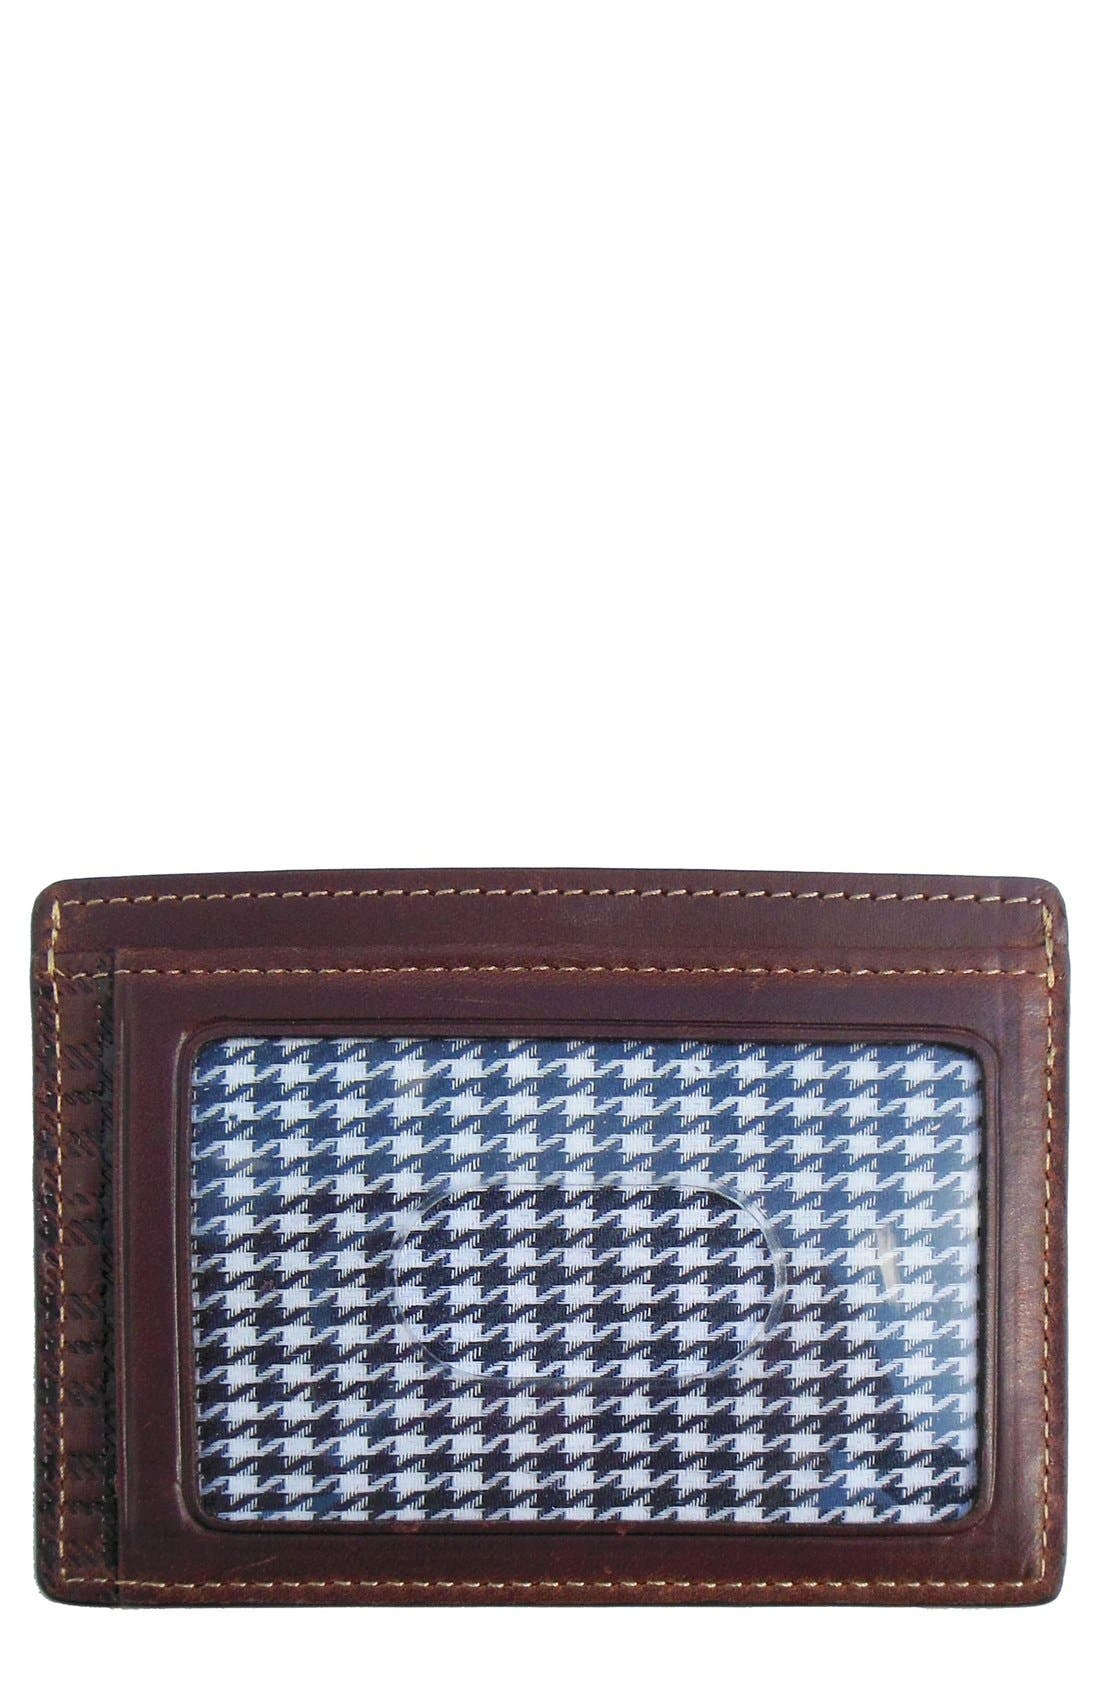 Bryant ID Card Case,                         Main,                         color, Antique Mahogany